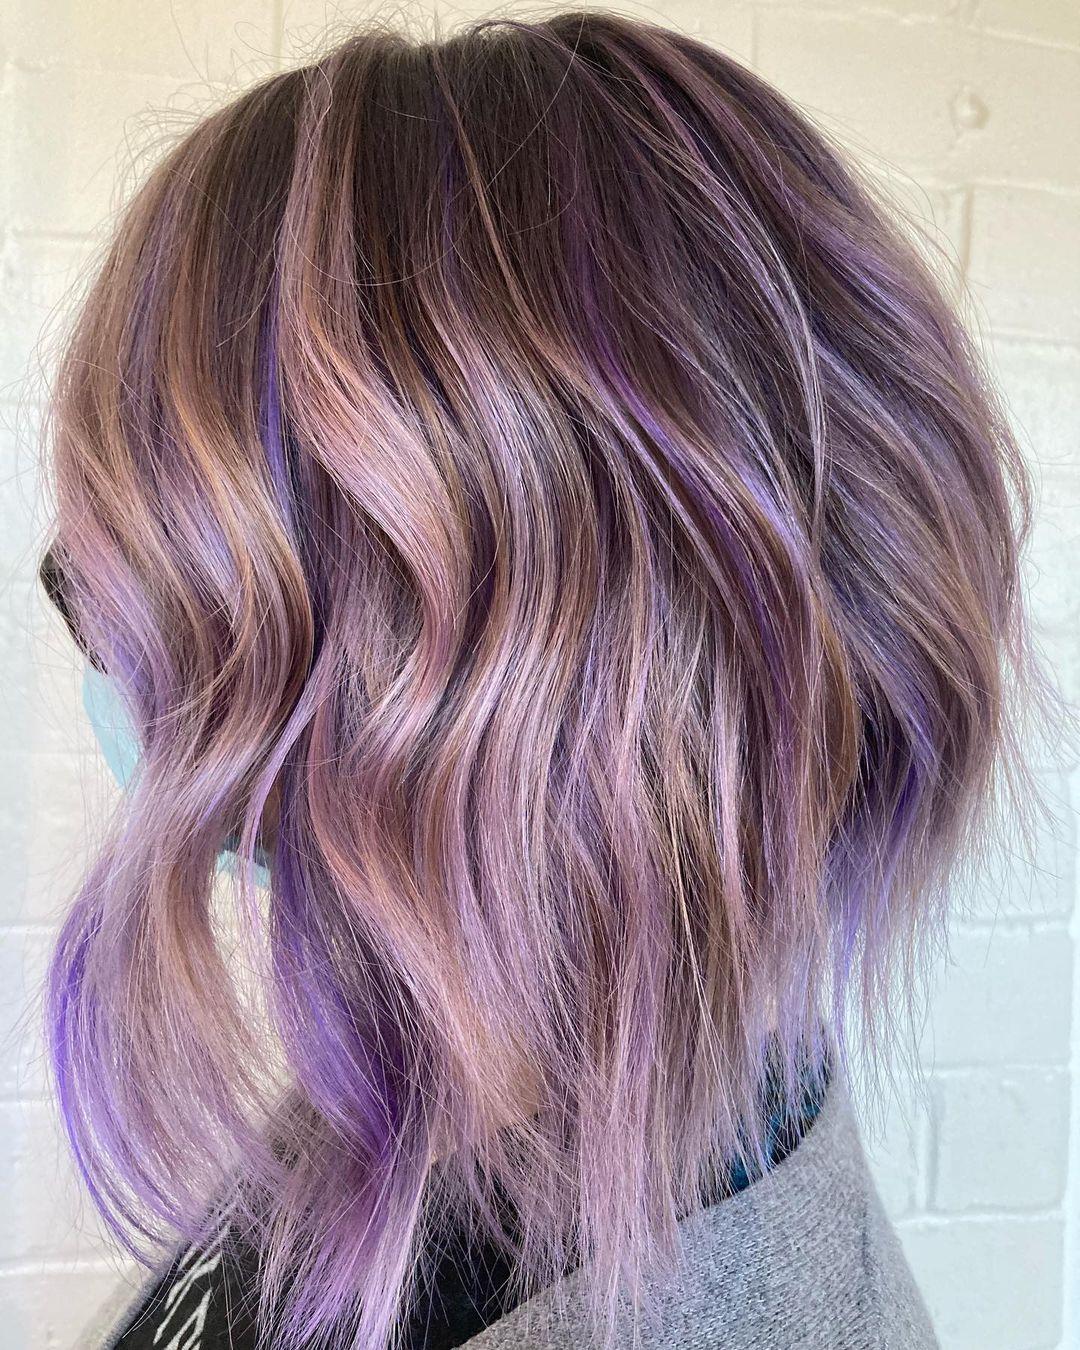 Bronde Lob with Purple Highlights